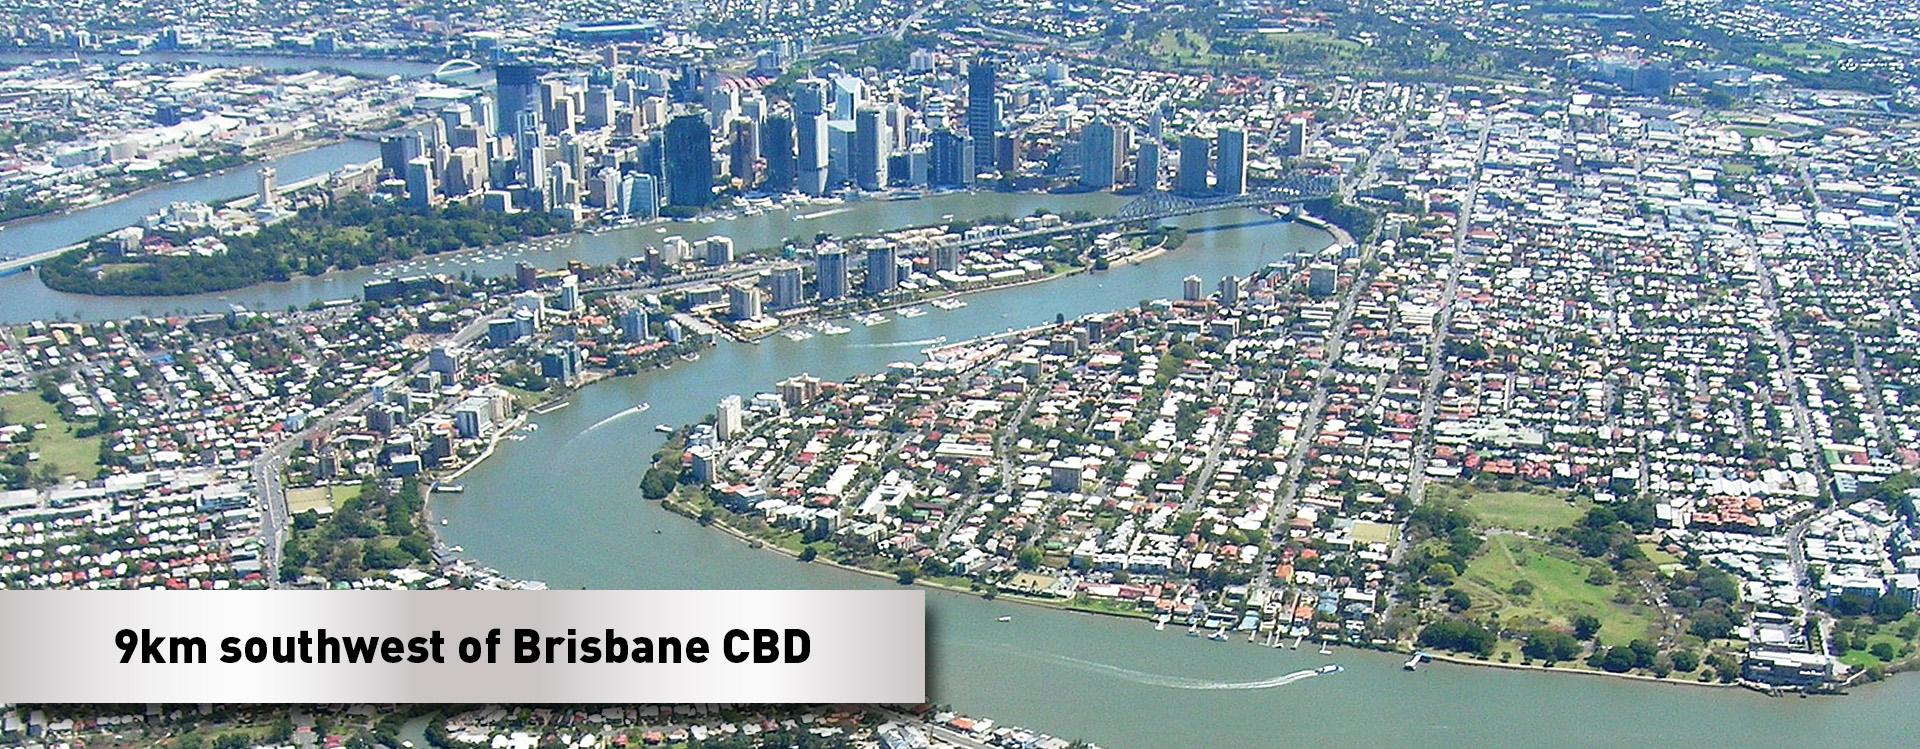 Brisbane-Satellite-map150415